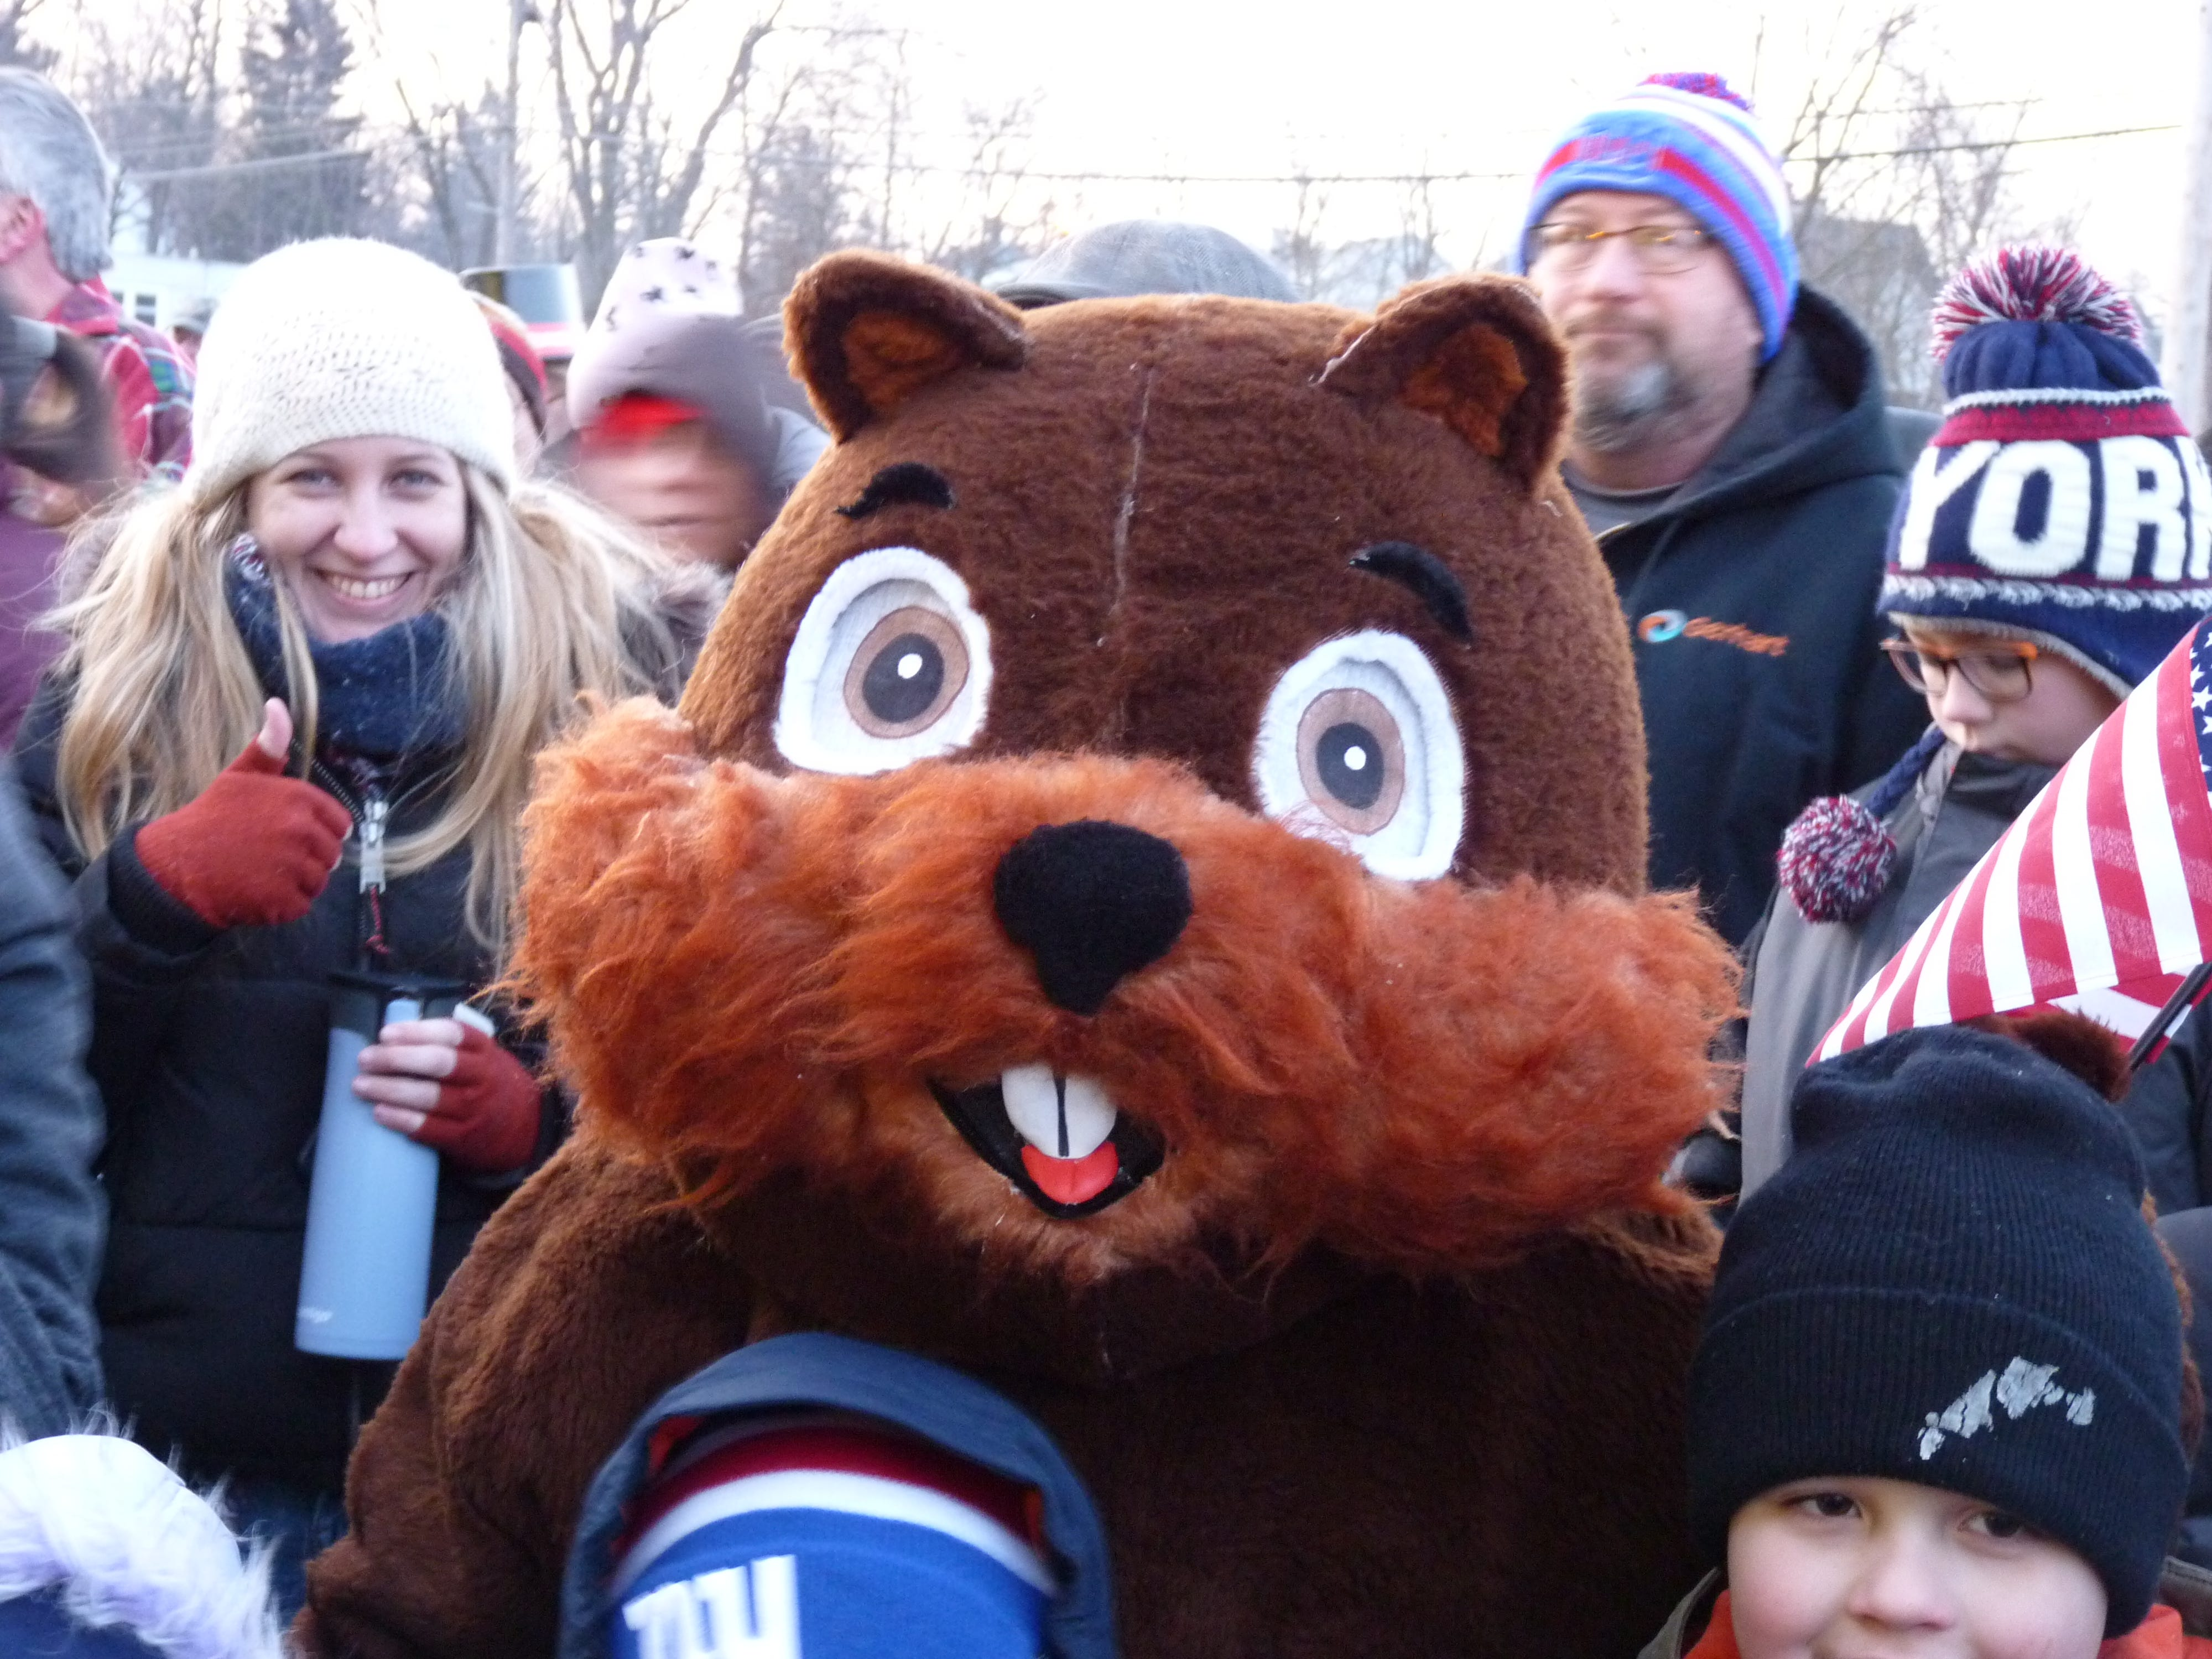 A groundhog mascot in Milltown on Groundhog Day.